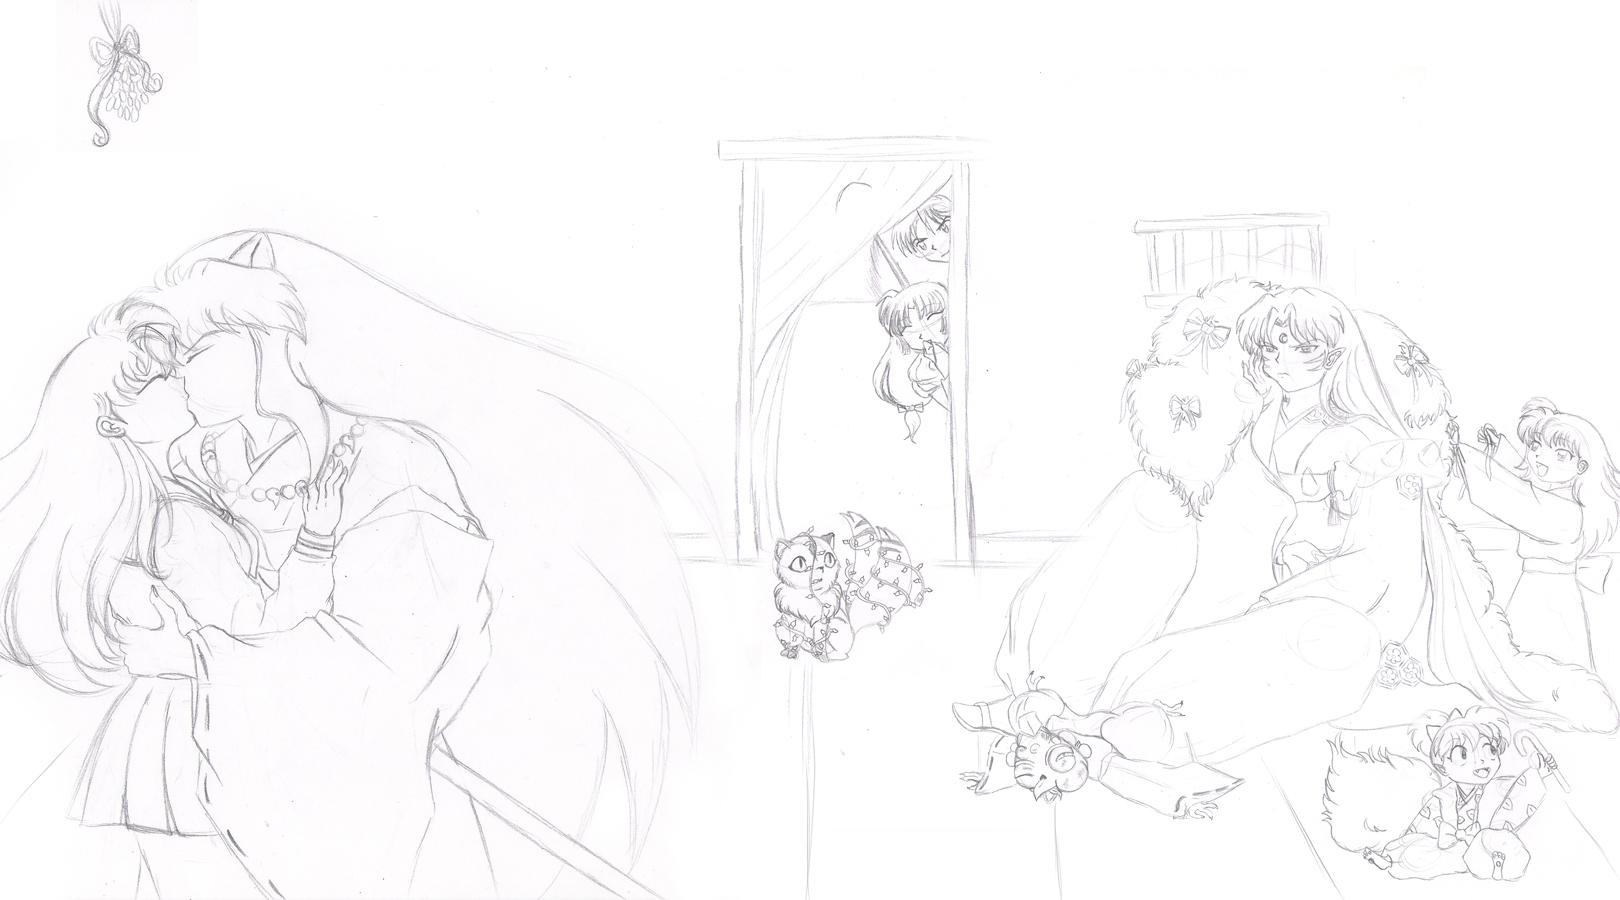 An Inuyasha Christmas sketch by SassyLilPanda on DeviantArt